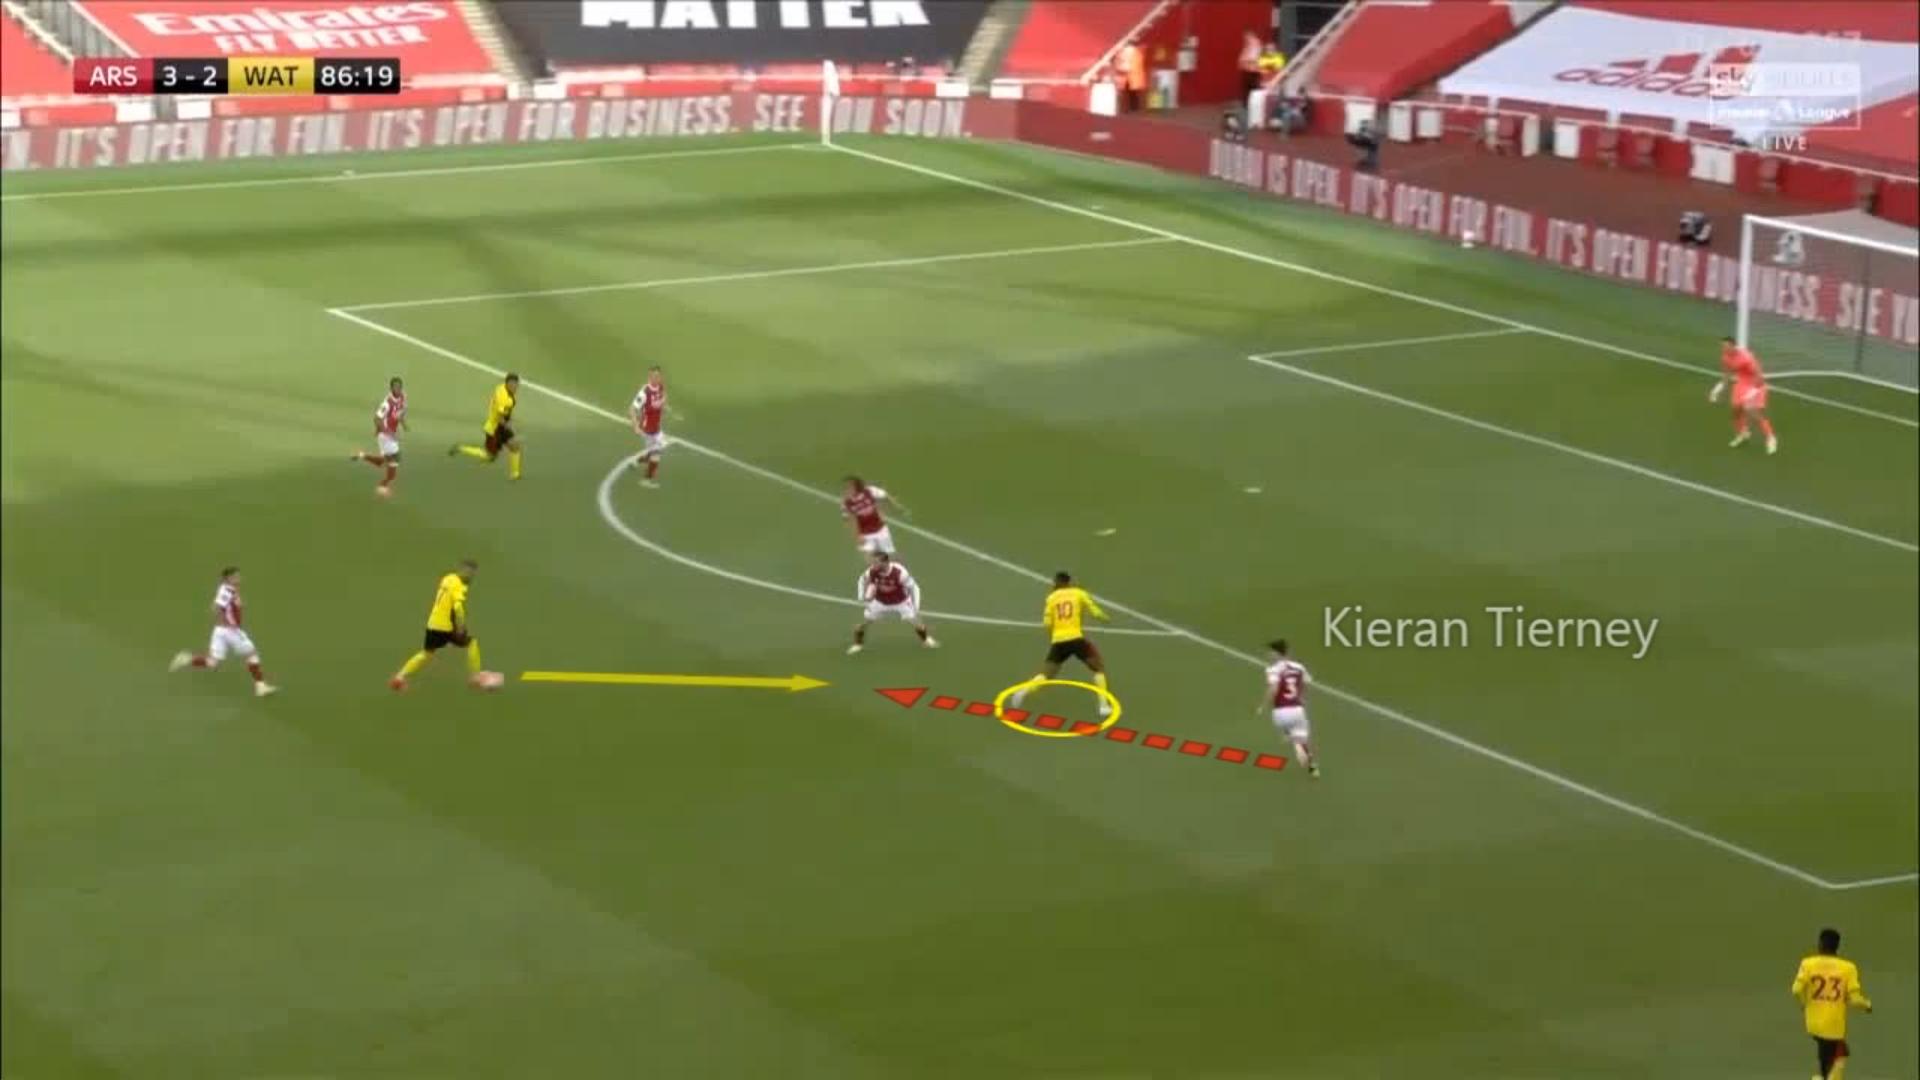 Kieran Tierney at Arsenal FC–A steal deal? - tactical analysis tactics